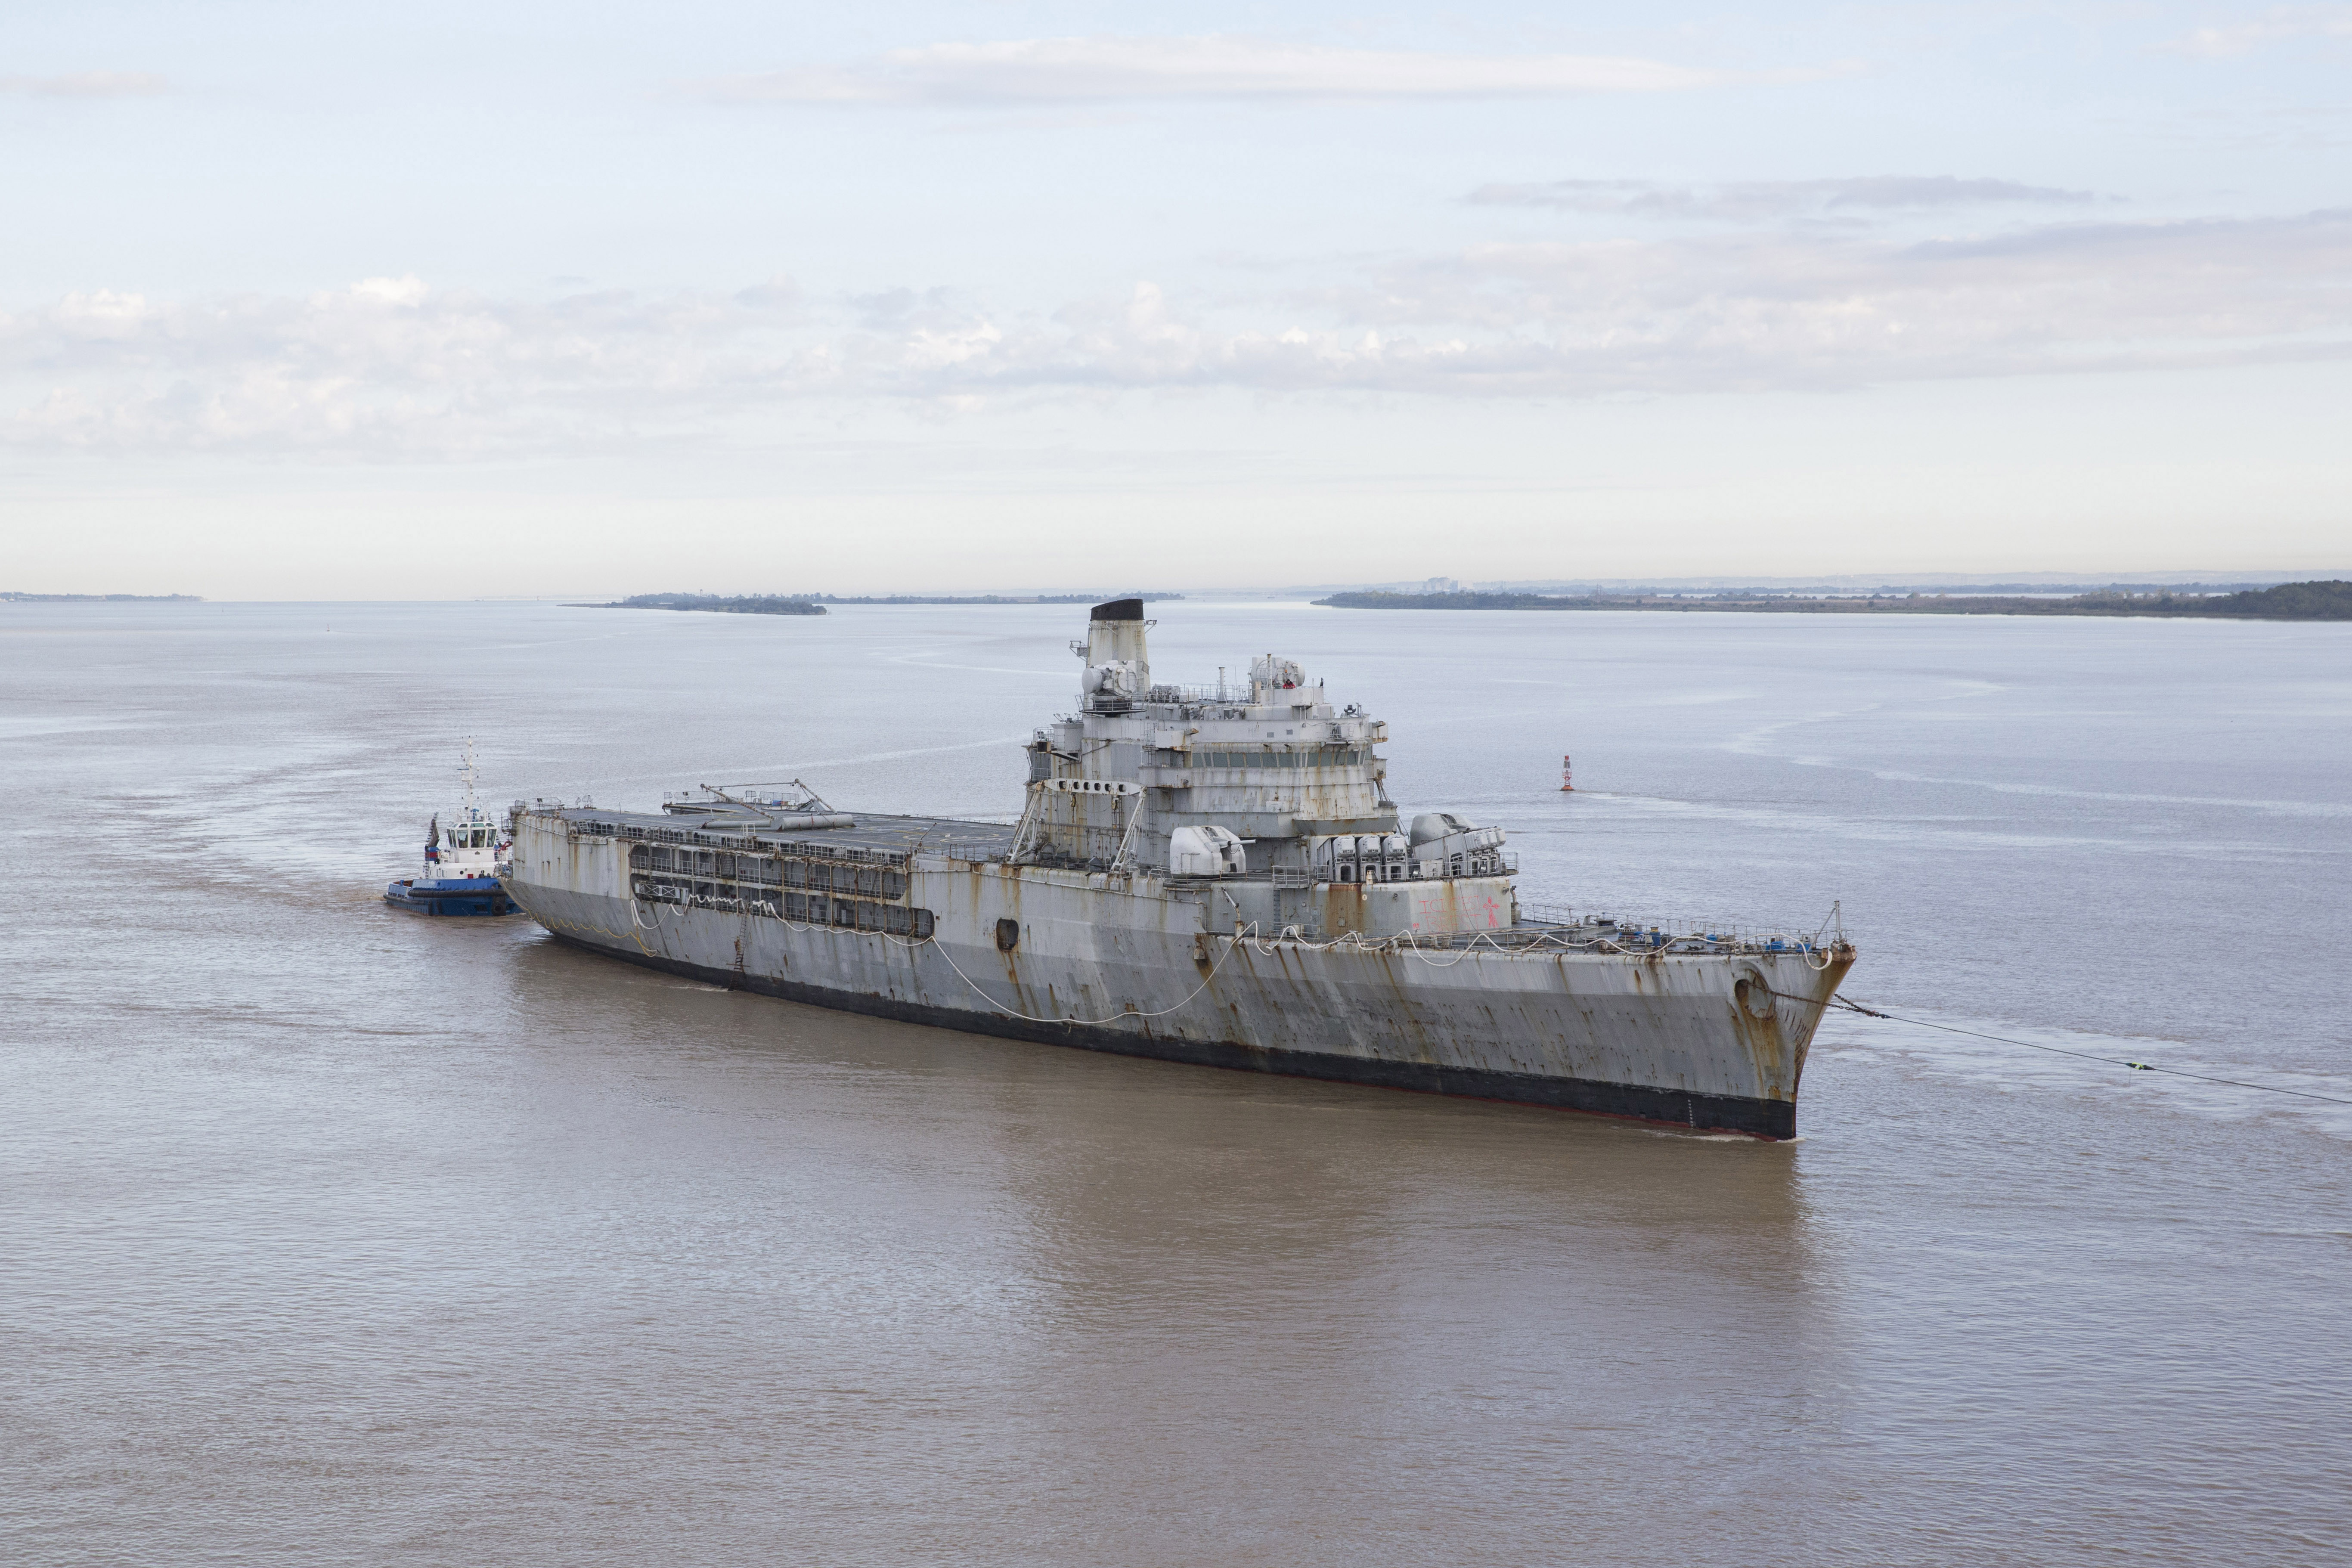 Topp-Decide va recycler les navires à Fos-Sur-Mer